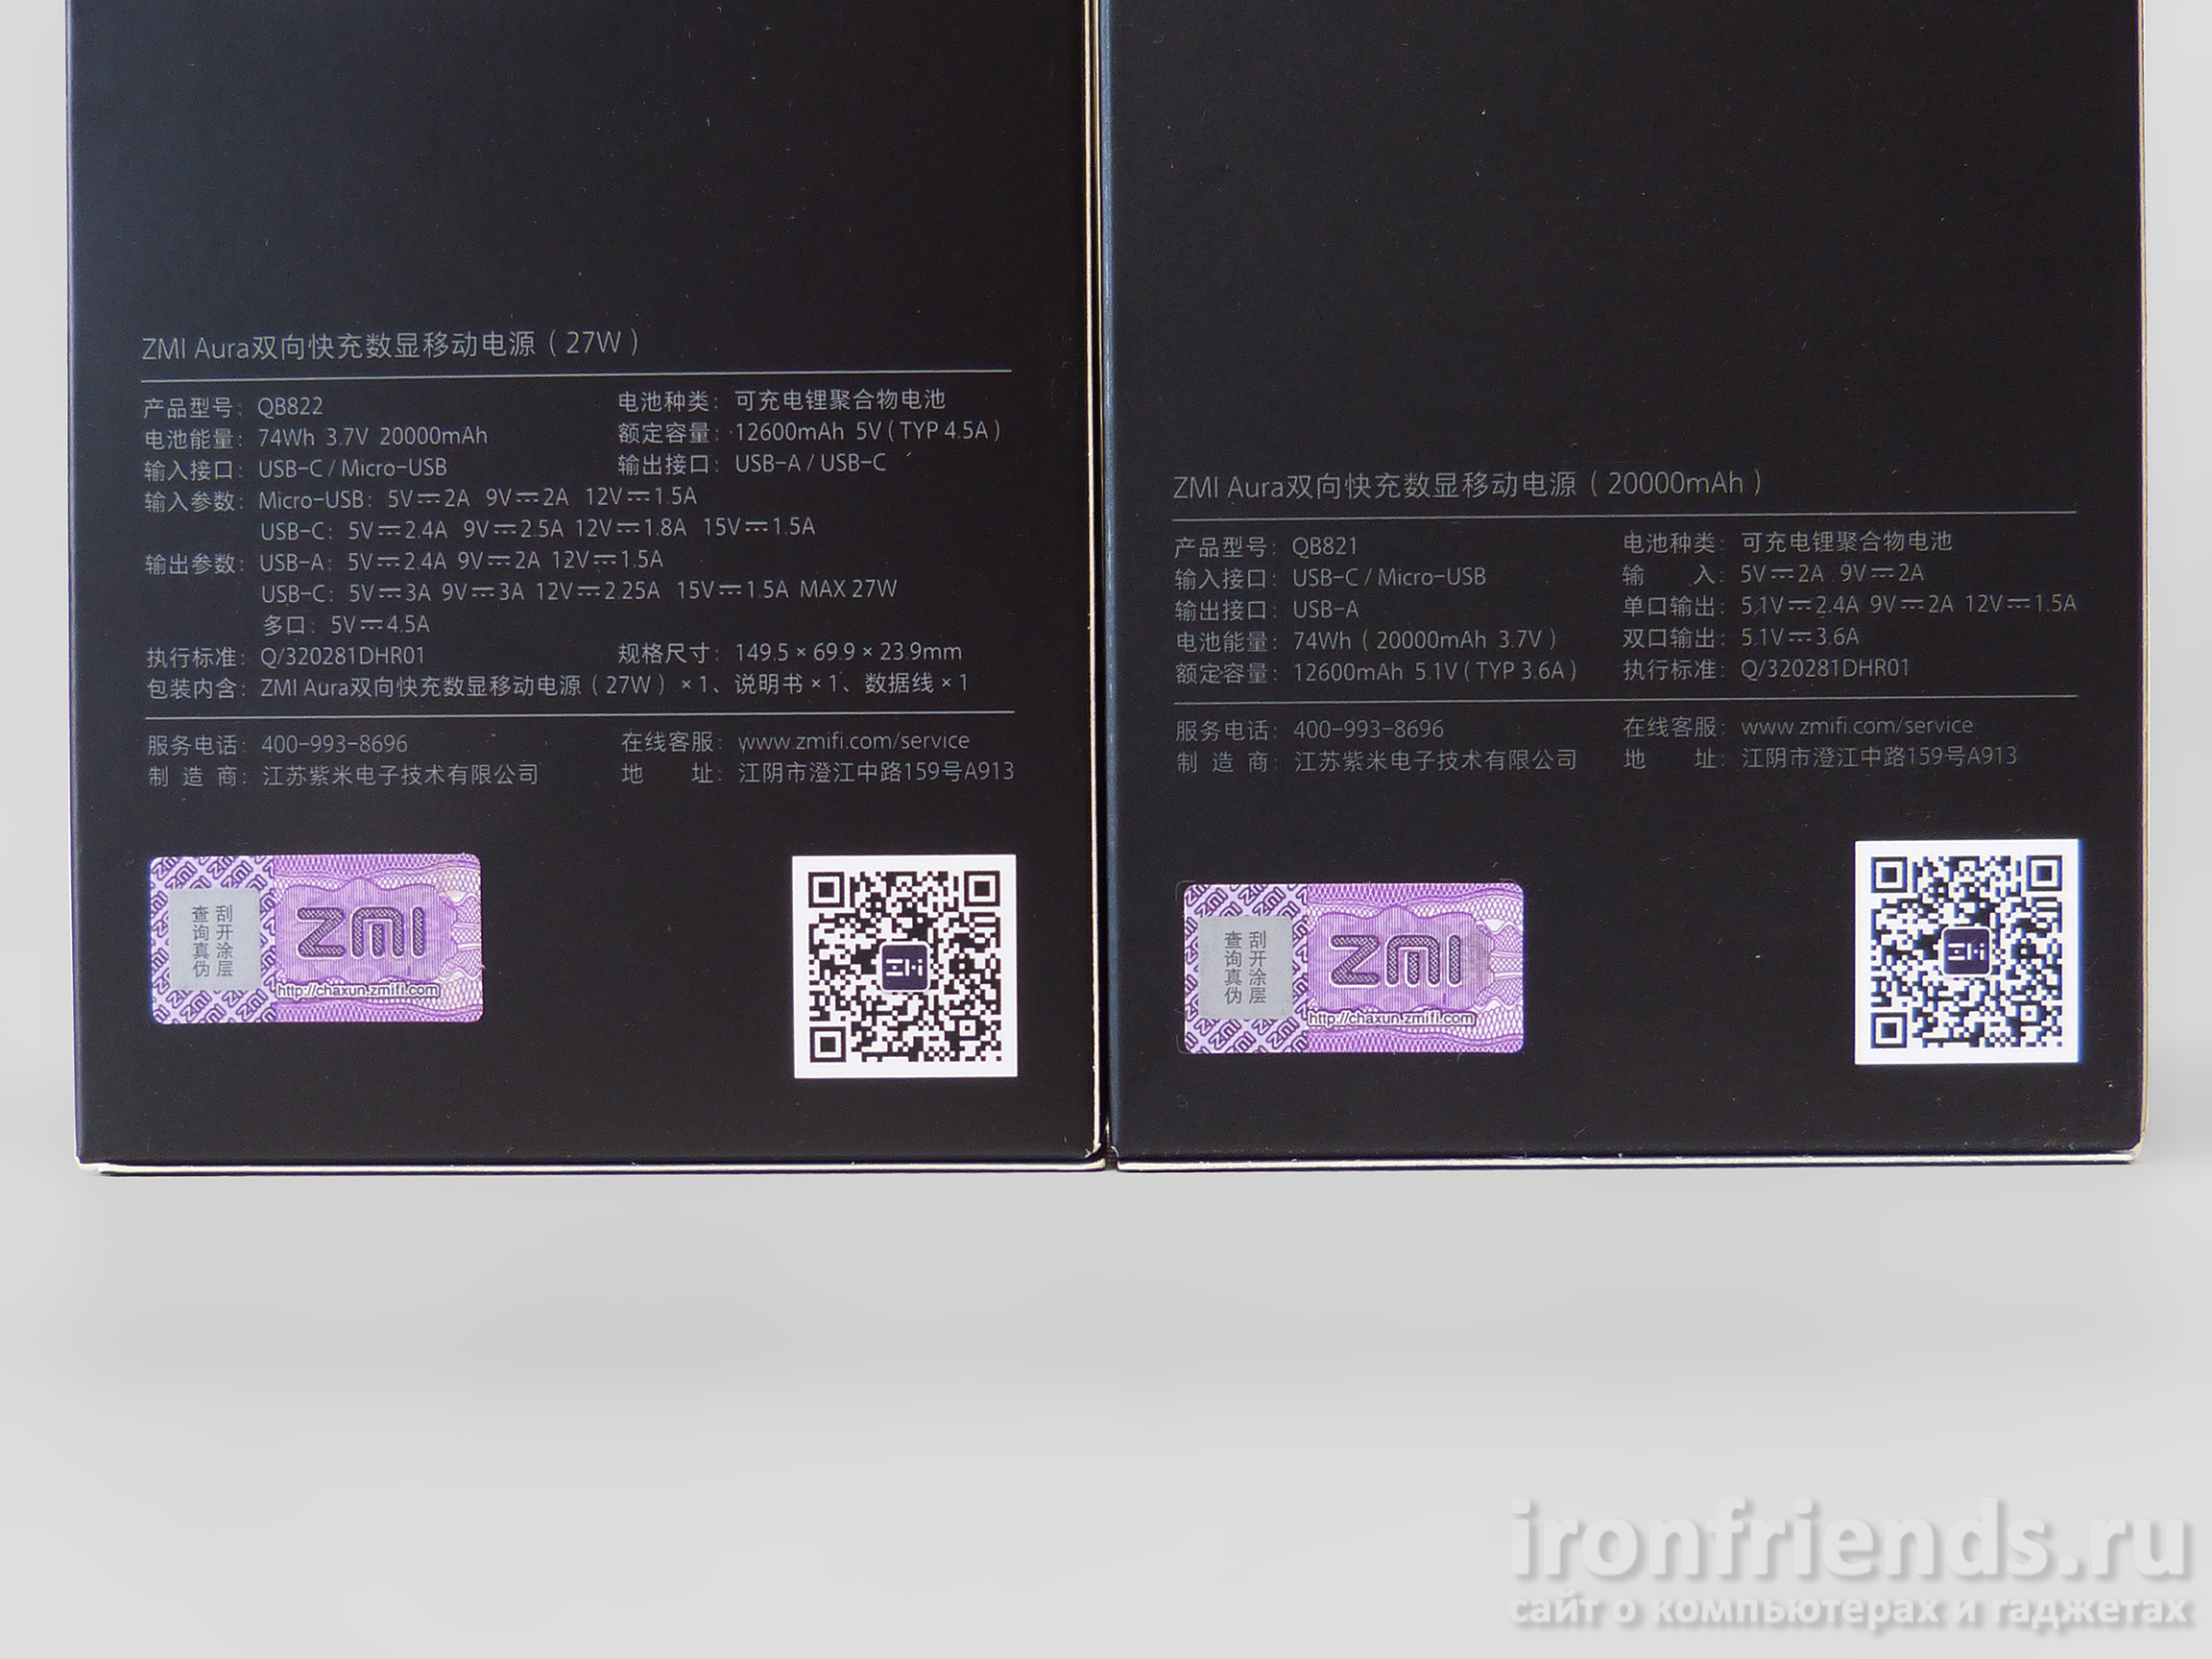 Характеристики Xiaomi ZMi Aura 20000